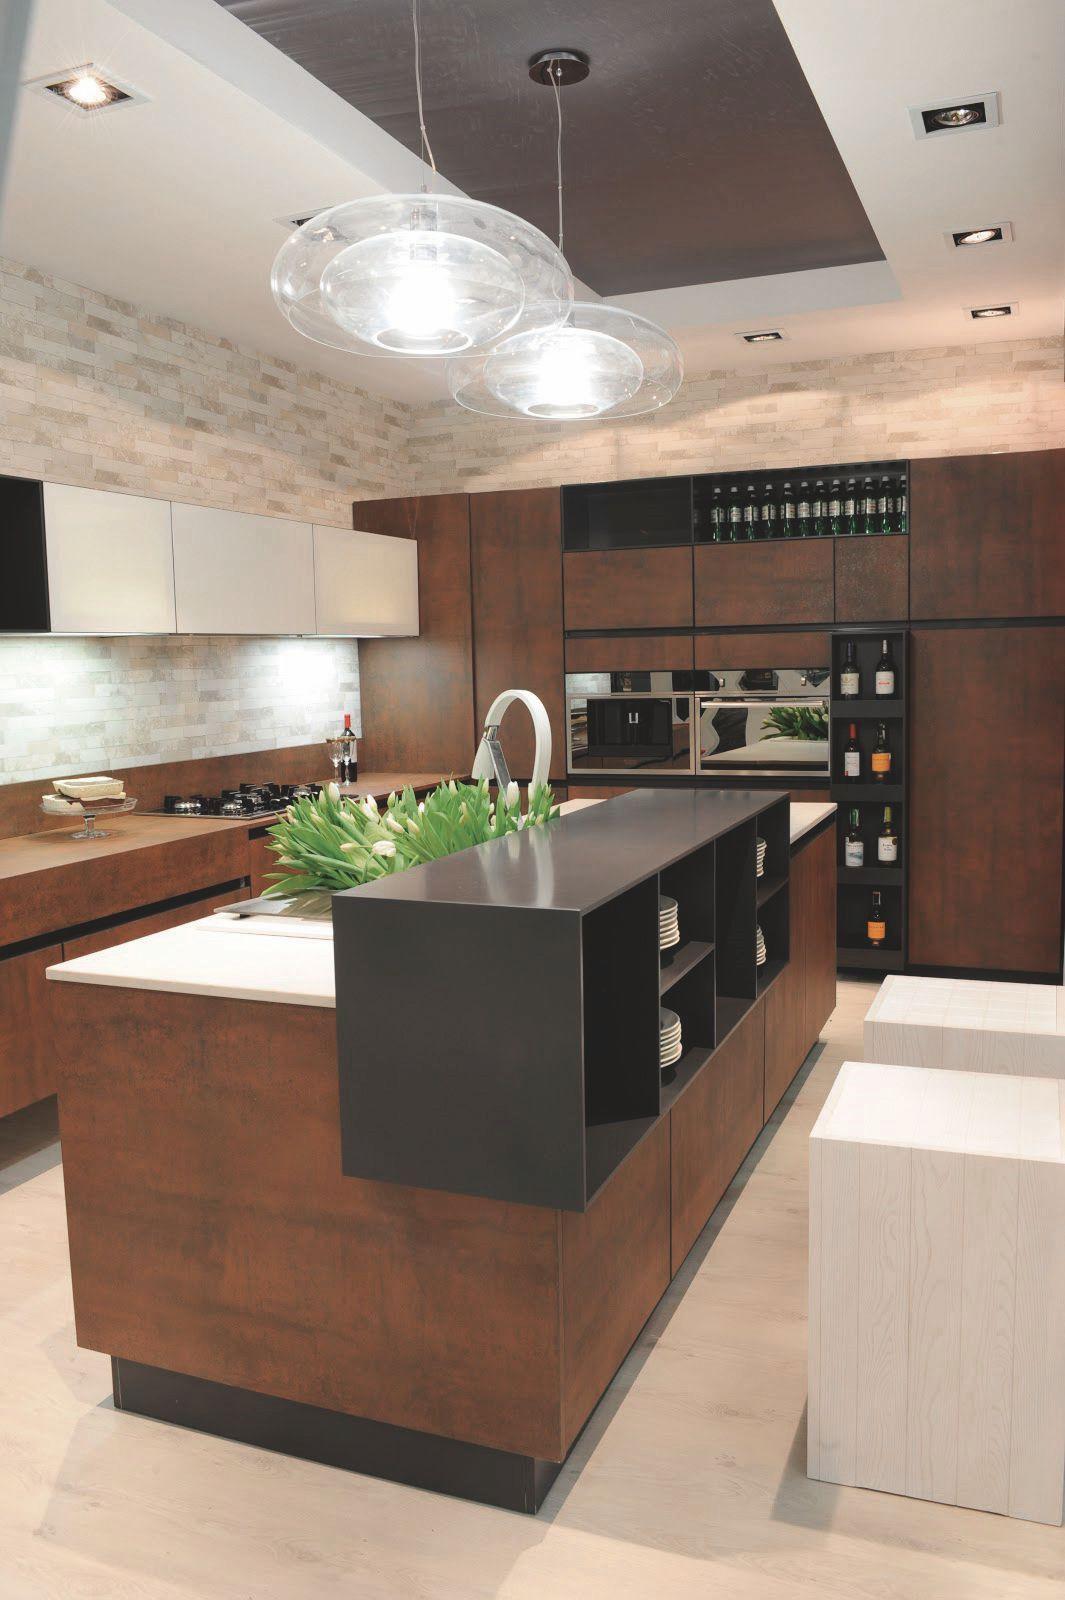 Cocina 63 cocinas capis dise o y fabricaci n de cocinas for Configurador de cocinas